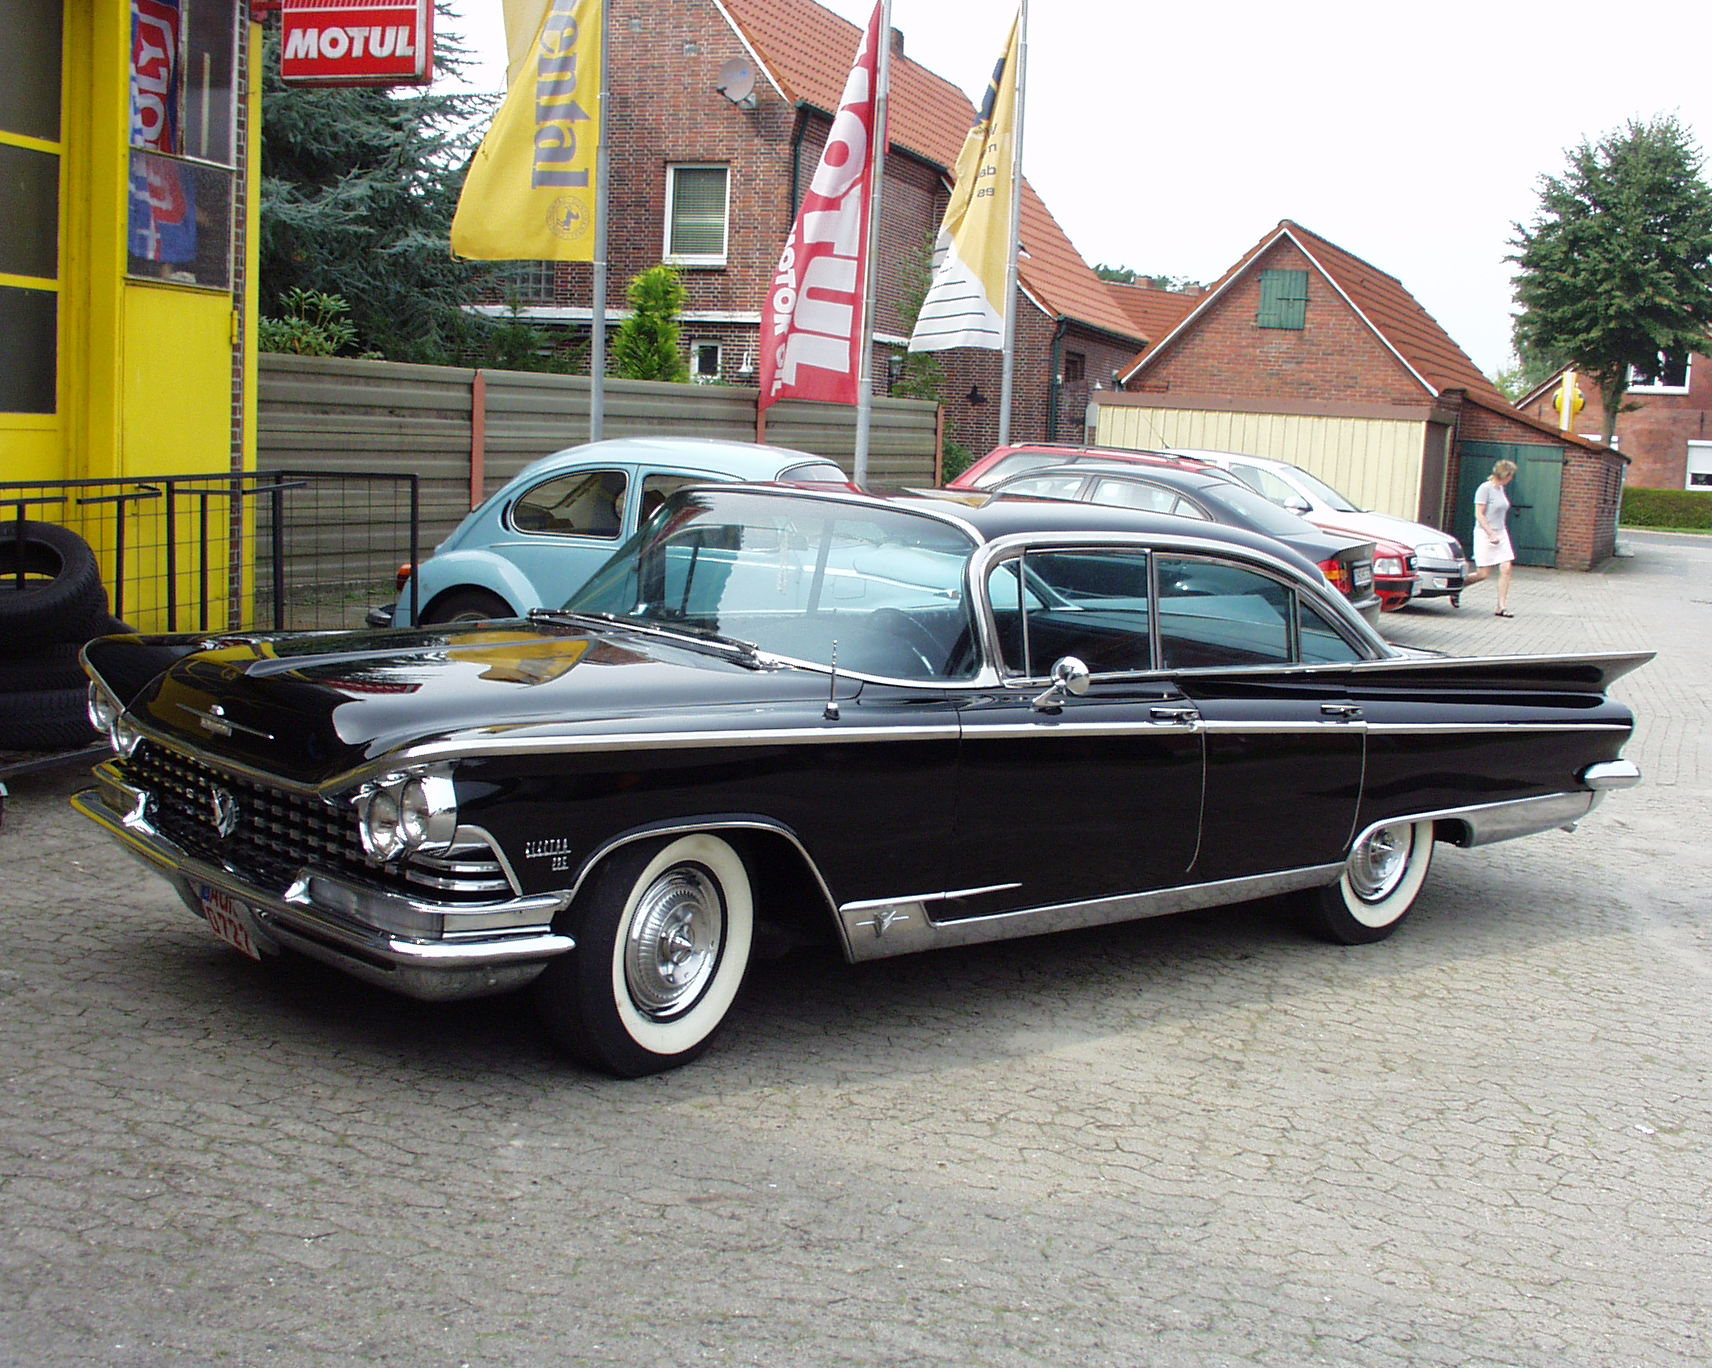 Buick Electra I 1959 - 1960 Sedan 2 door #6